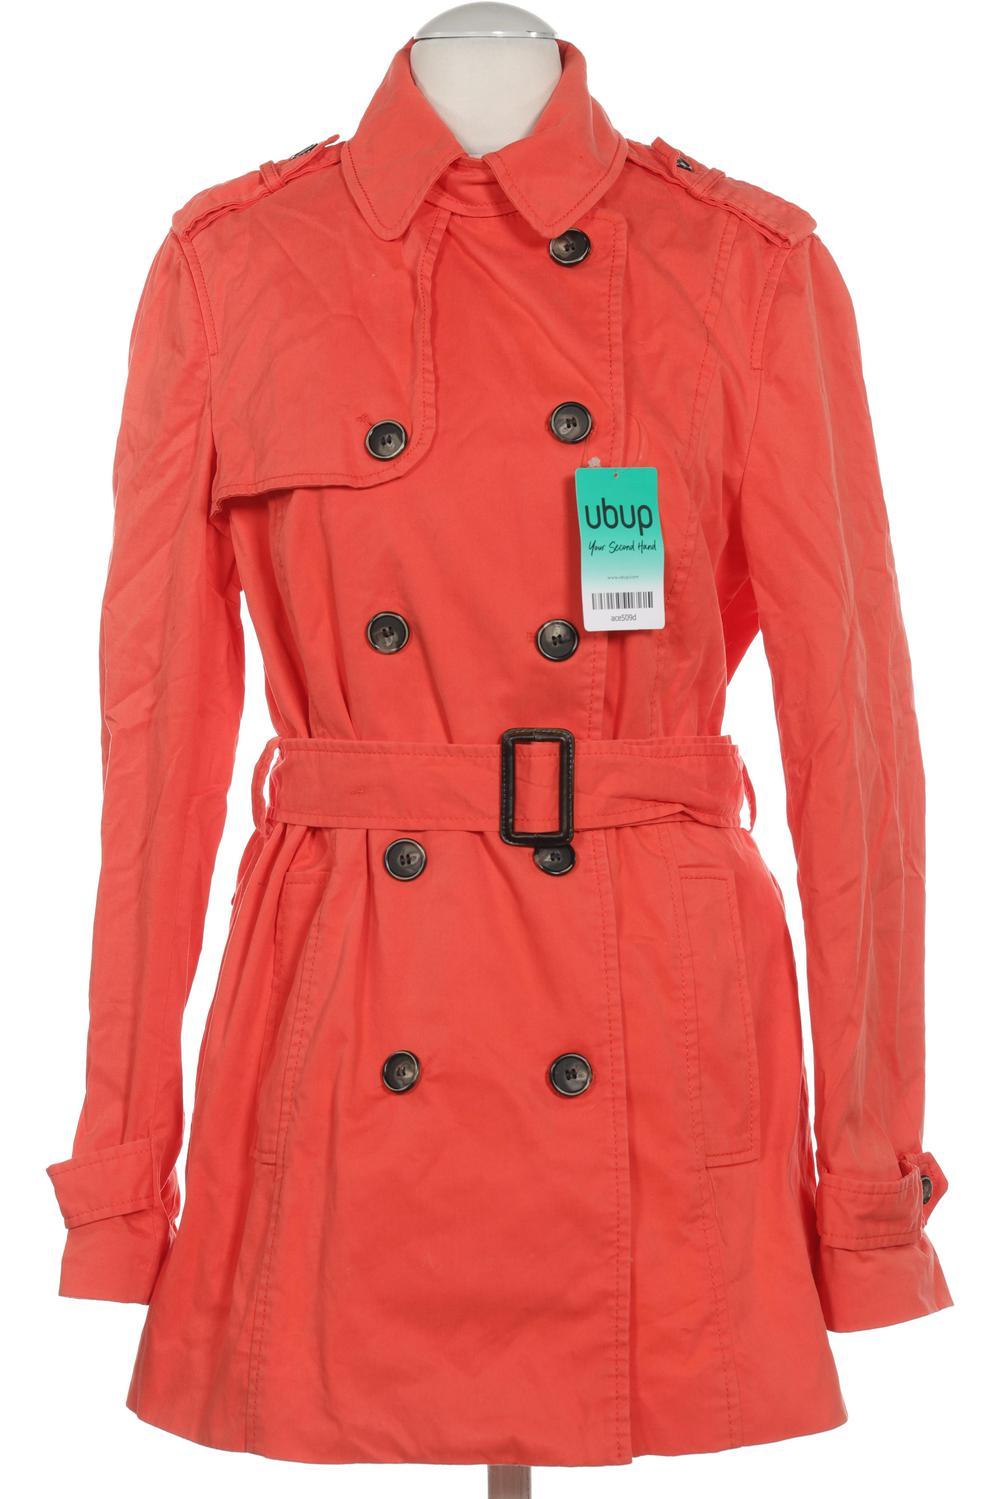 ZARA Damen Mantel INT L Second Hand kaufen | ubup